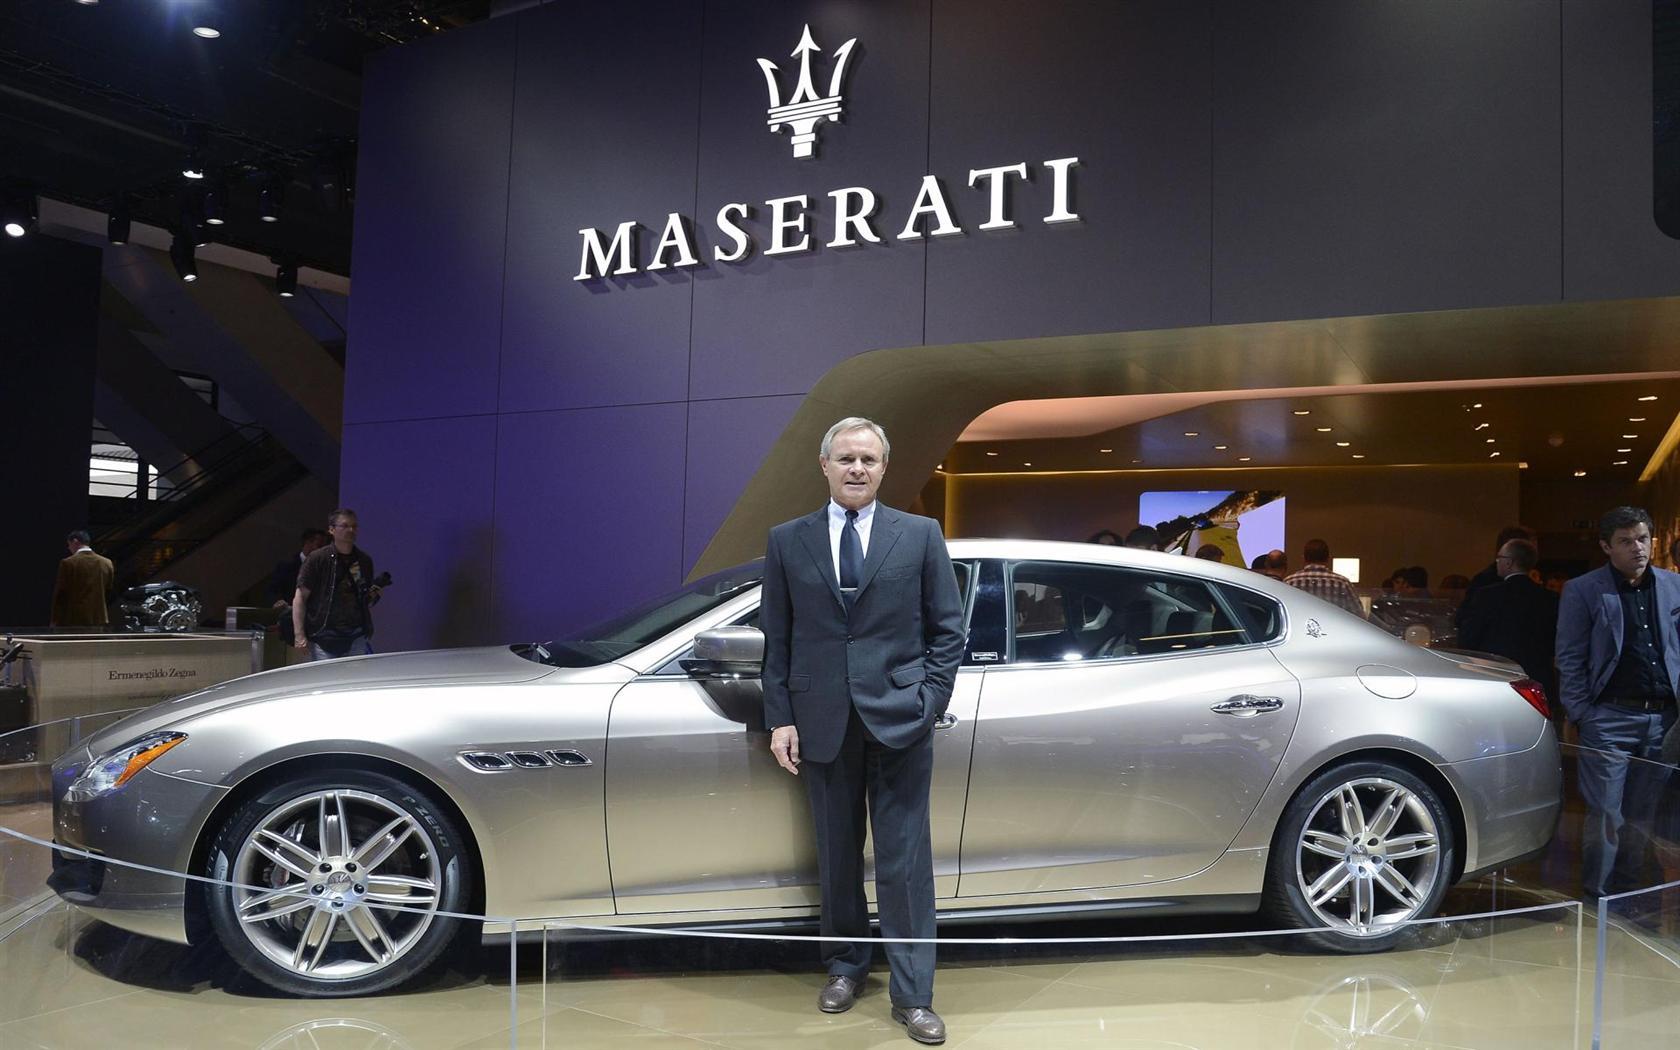 http://www.conceptcarz.com/images/Maserati/Maserati-Zegna-LE_Concept-001-1680.jpg